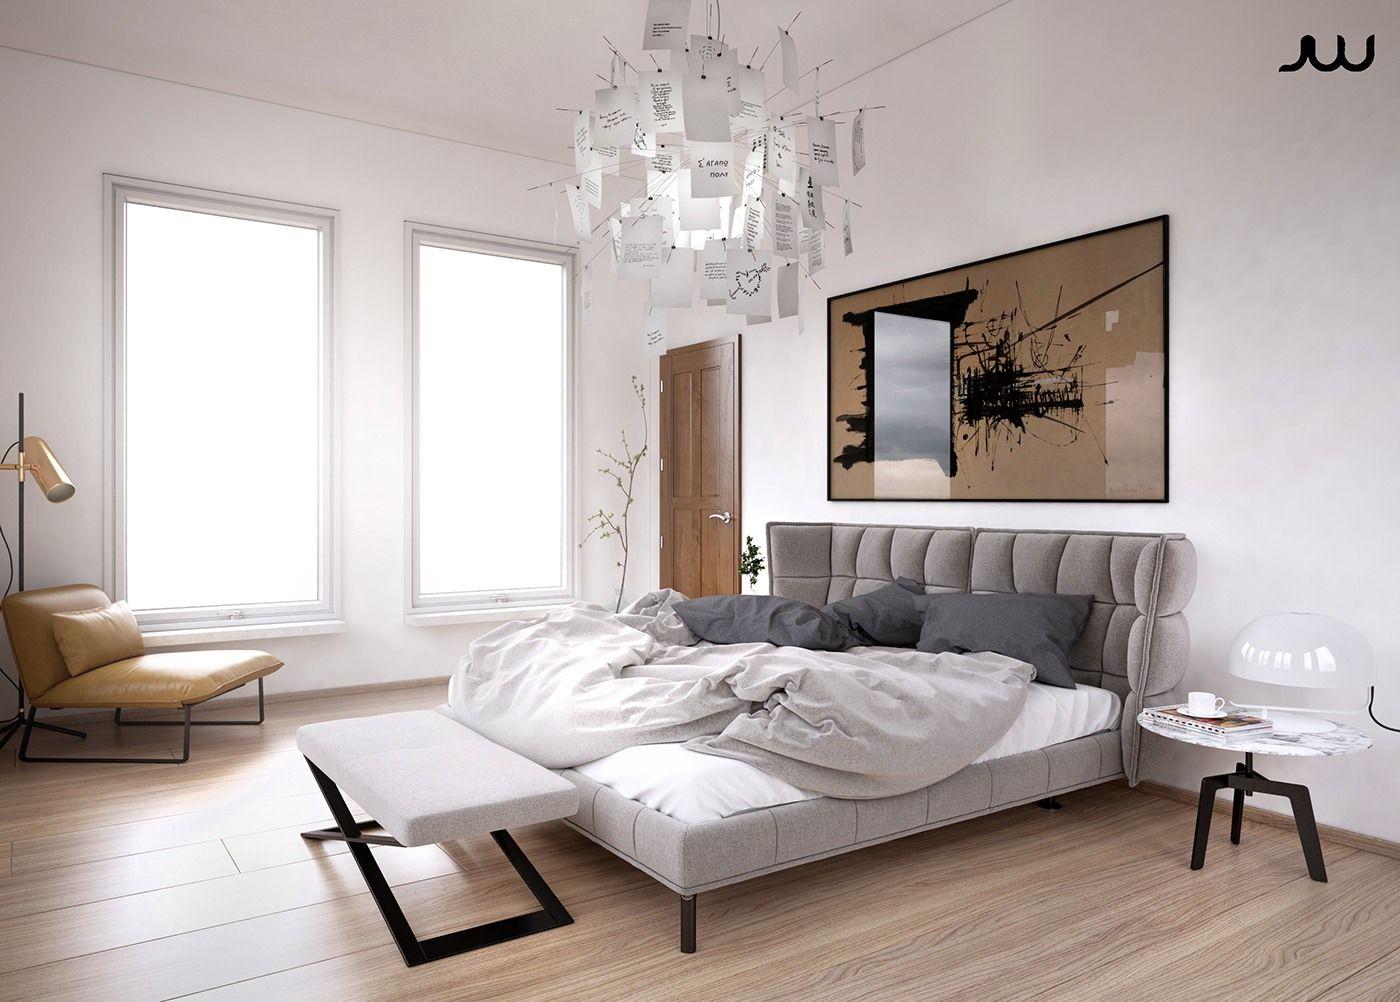 New York Apartment Bedroom Ideas livingpursuit 61 Fifth Avenue